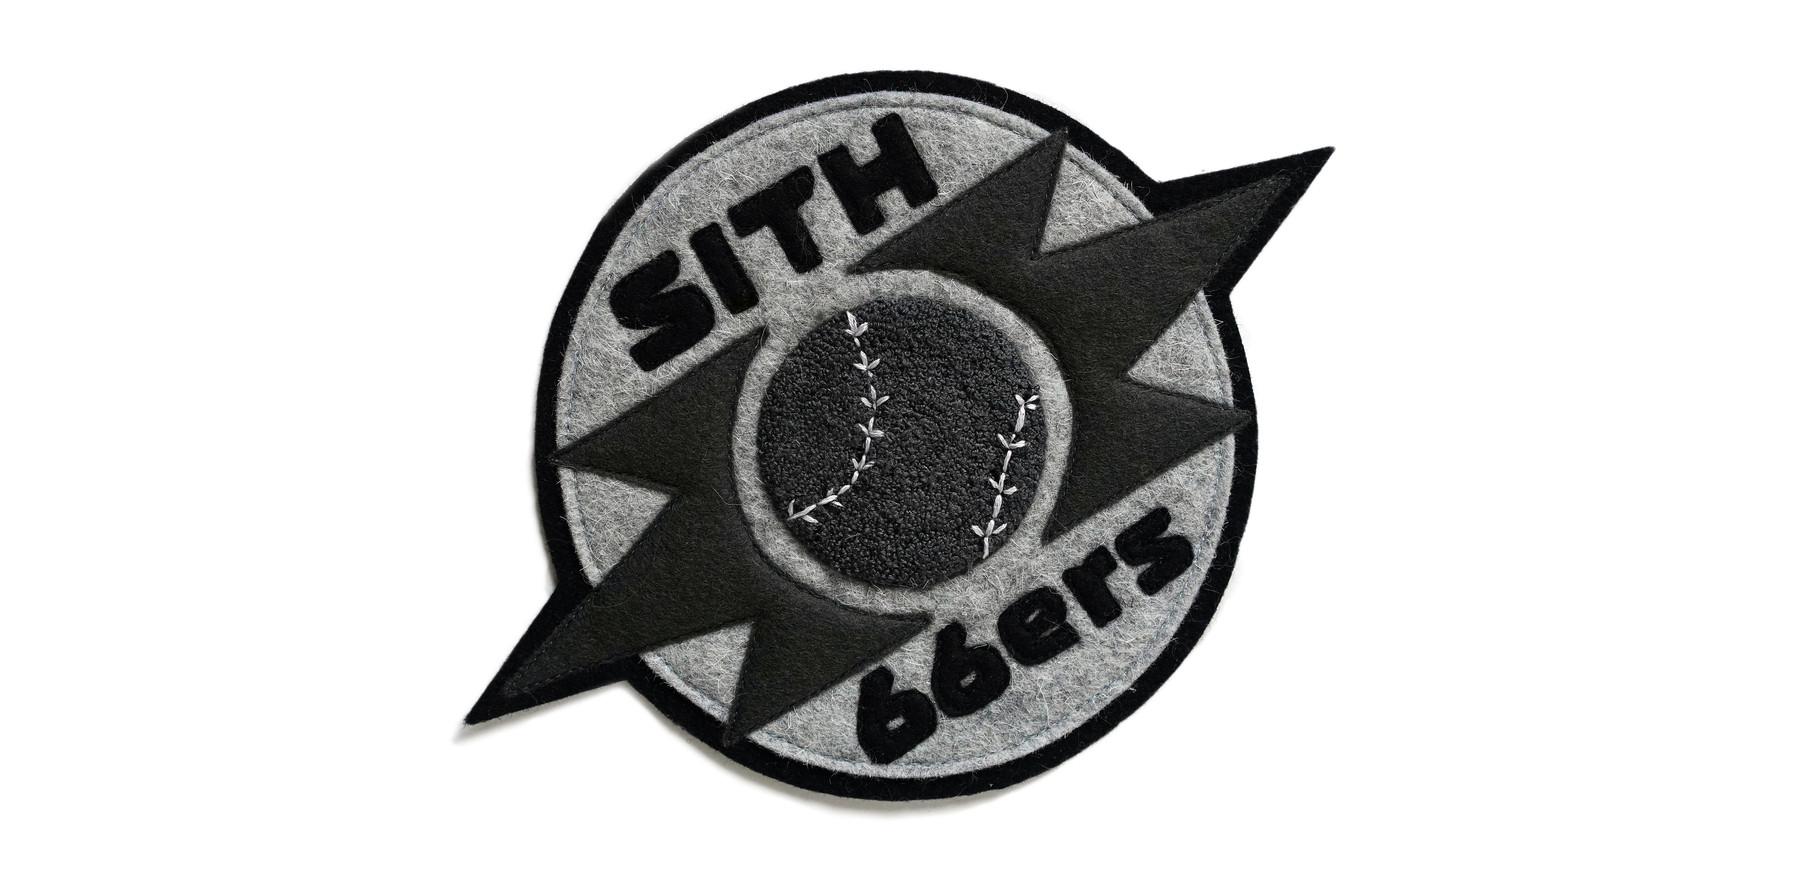 Sith 66ers